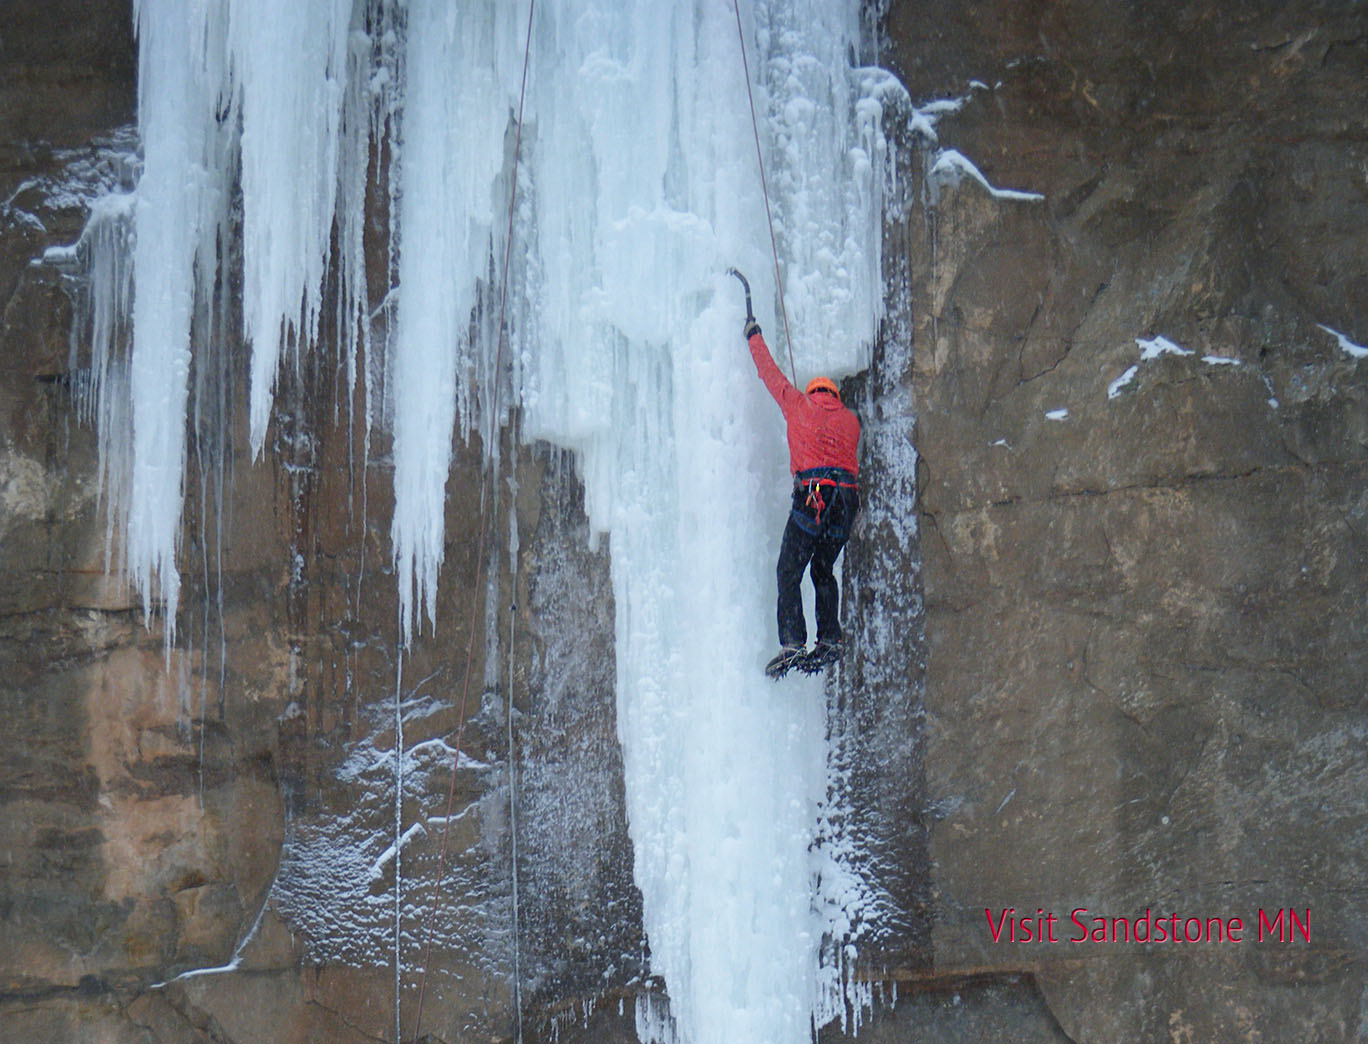 sandstone ice climbing